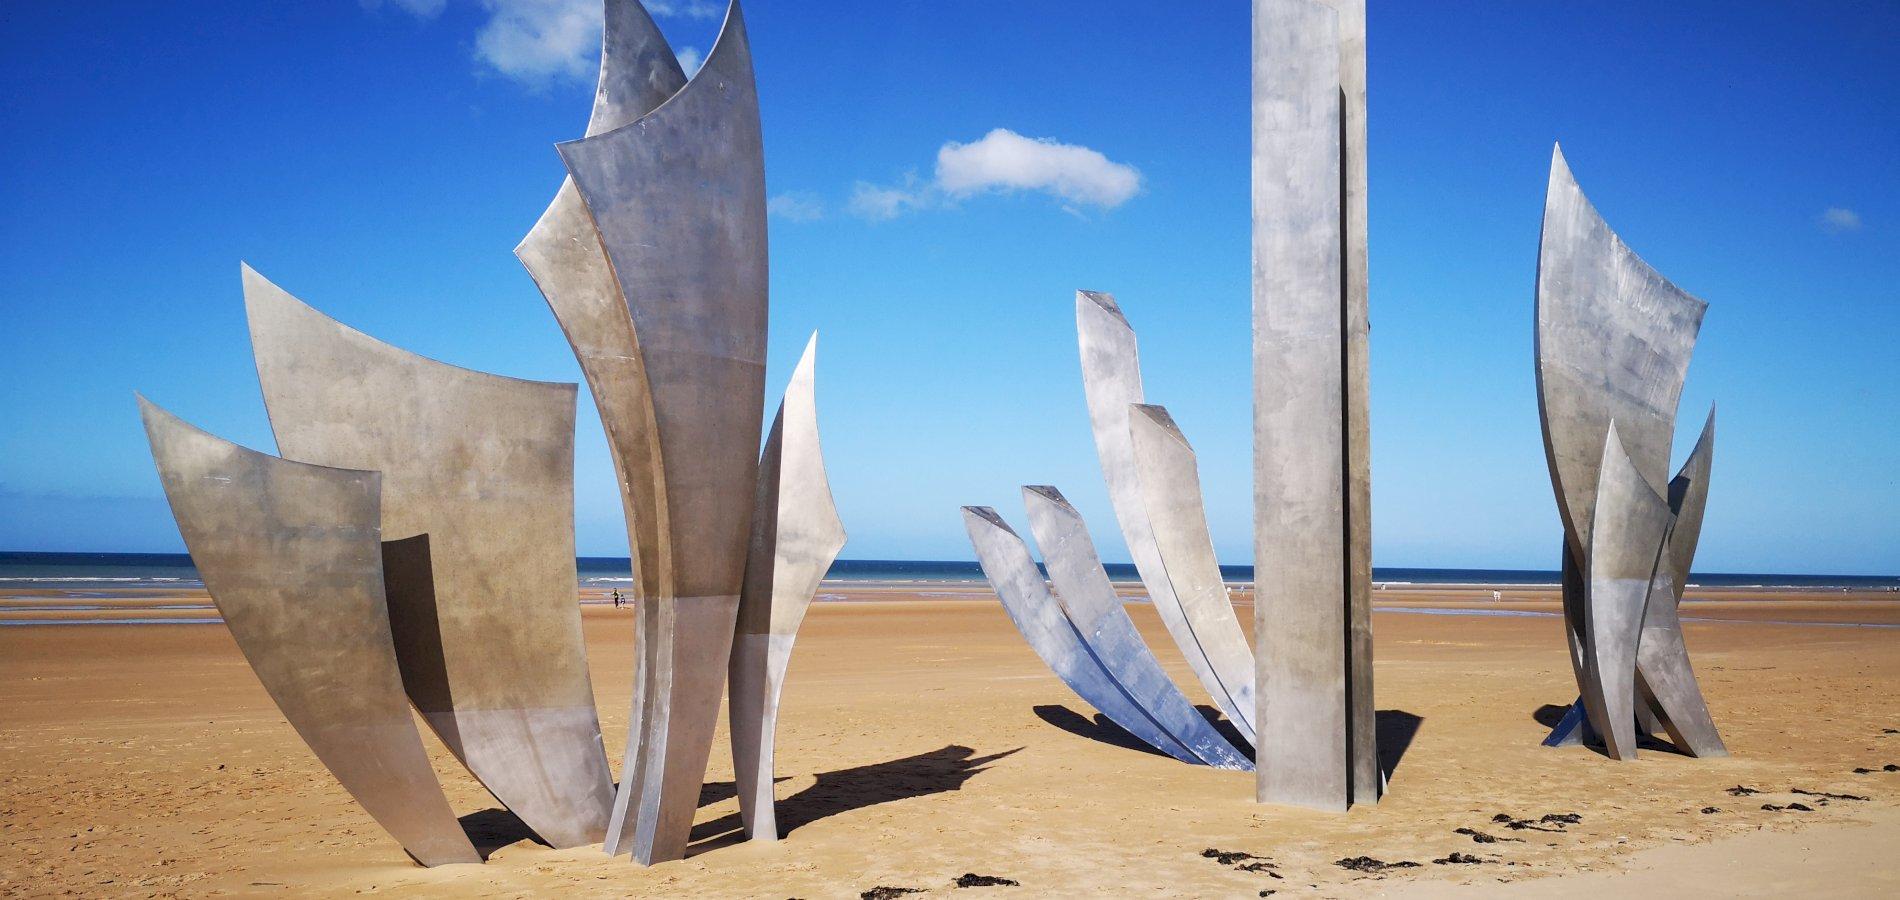 Ophorus Tours - Omaha Beach U.S Sector Shared Half Day Trip From Bayeux